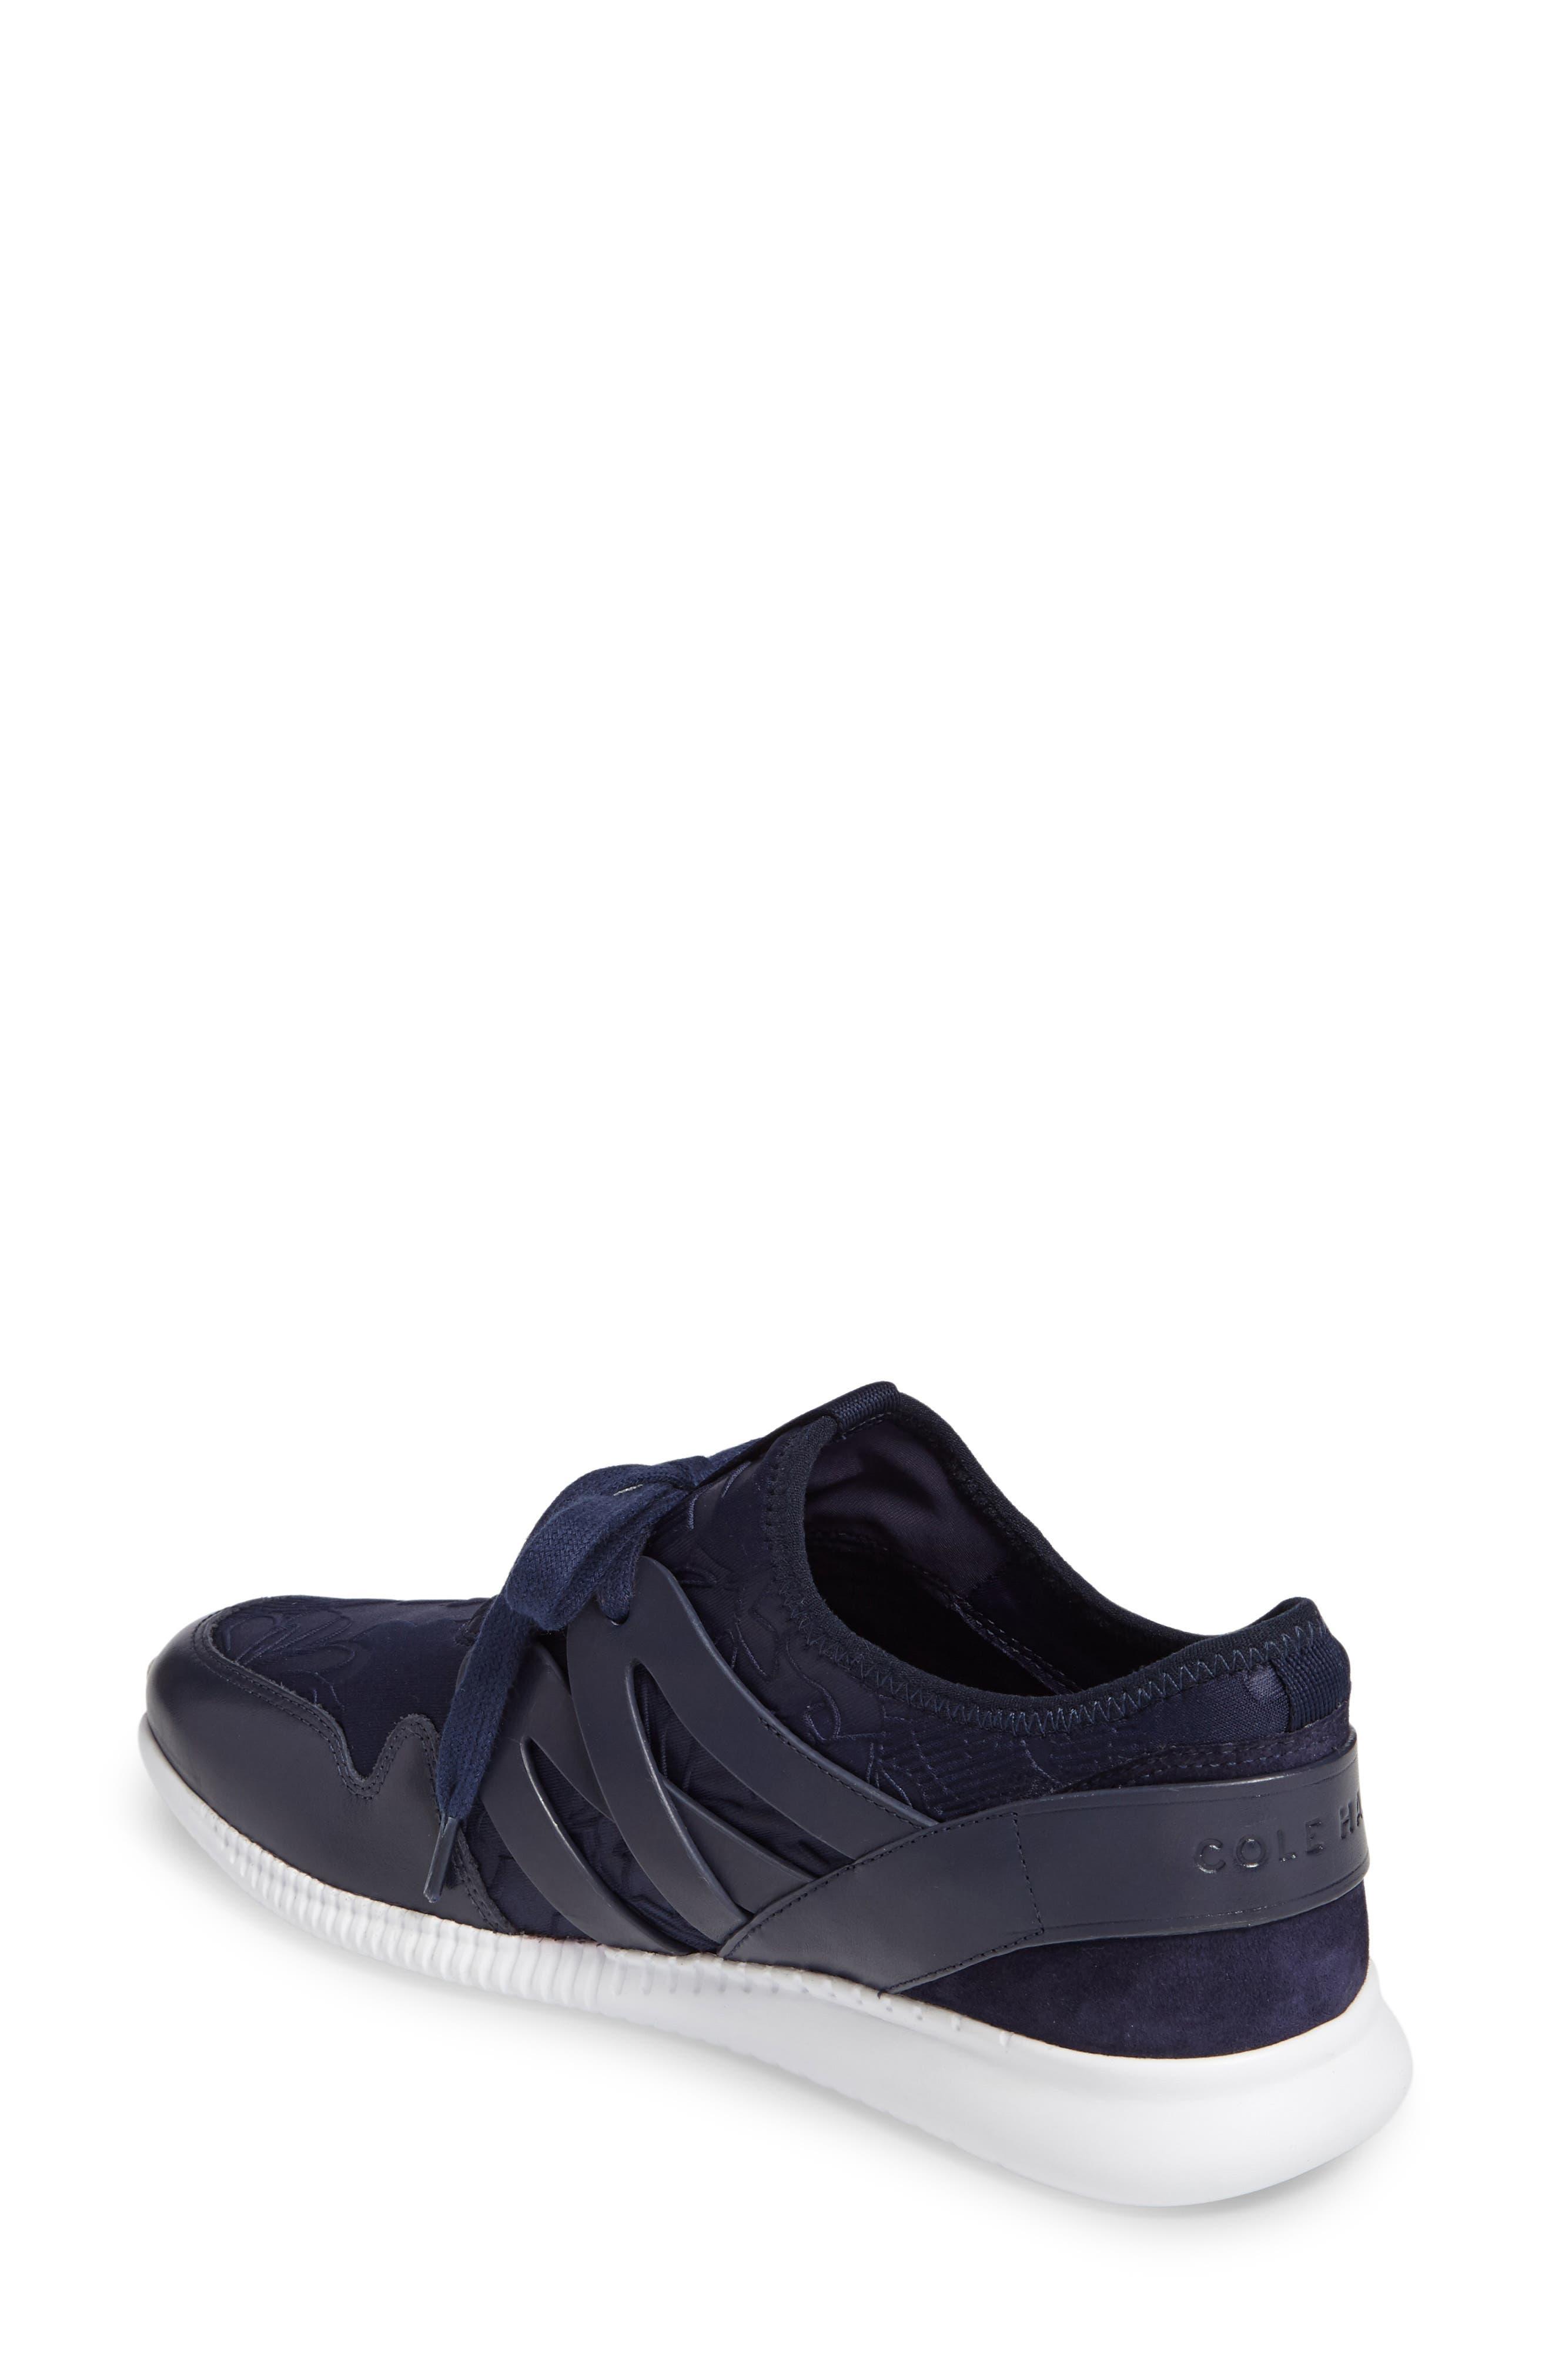 'StudioGrand' Sneaker,                             Alternate thumbnail 15, color,